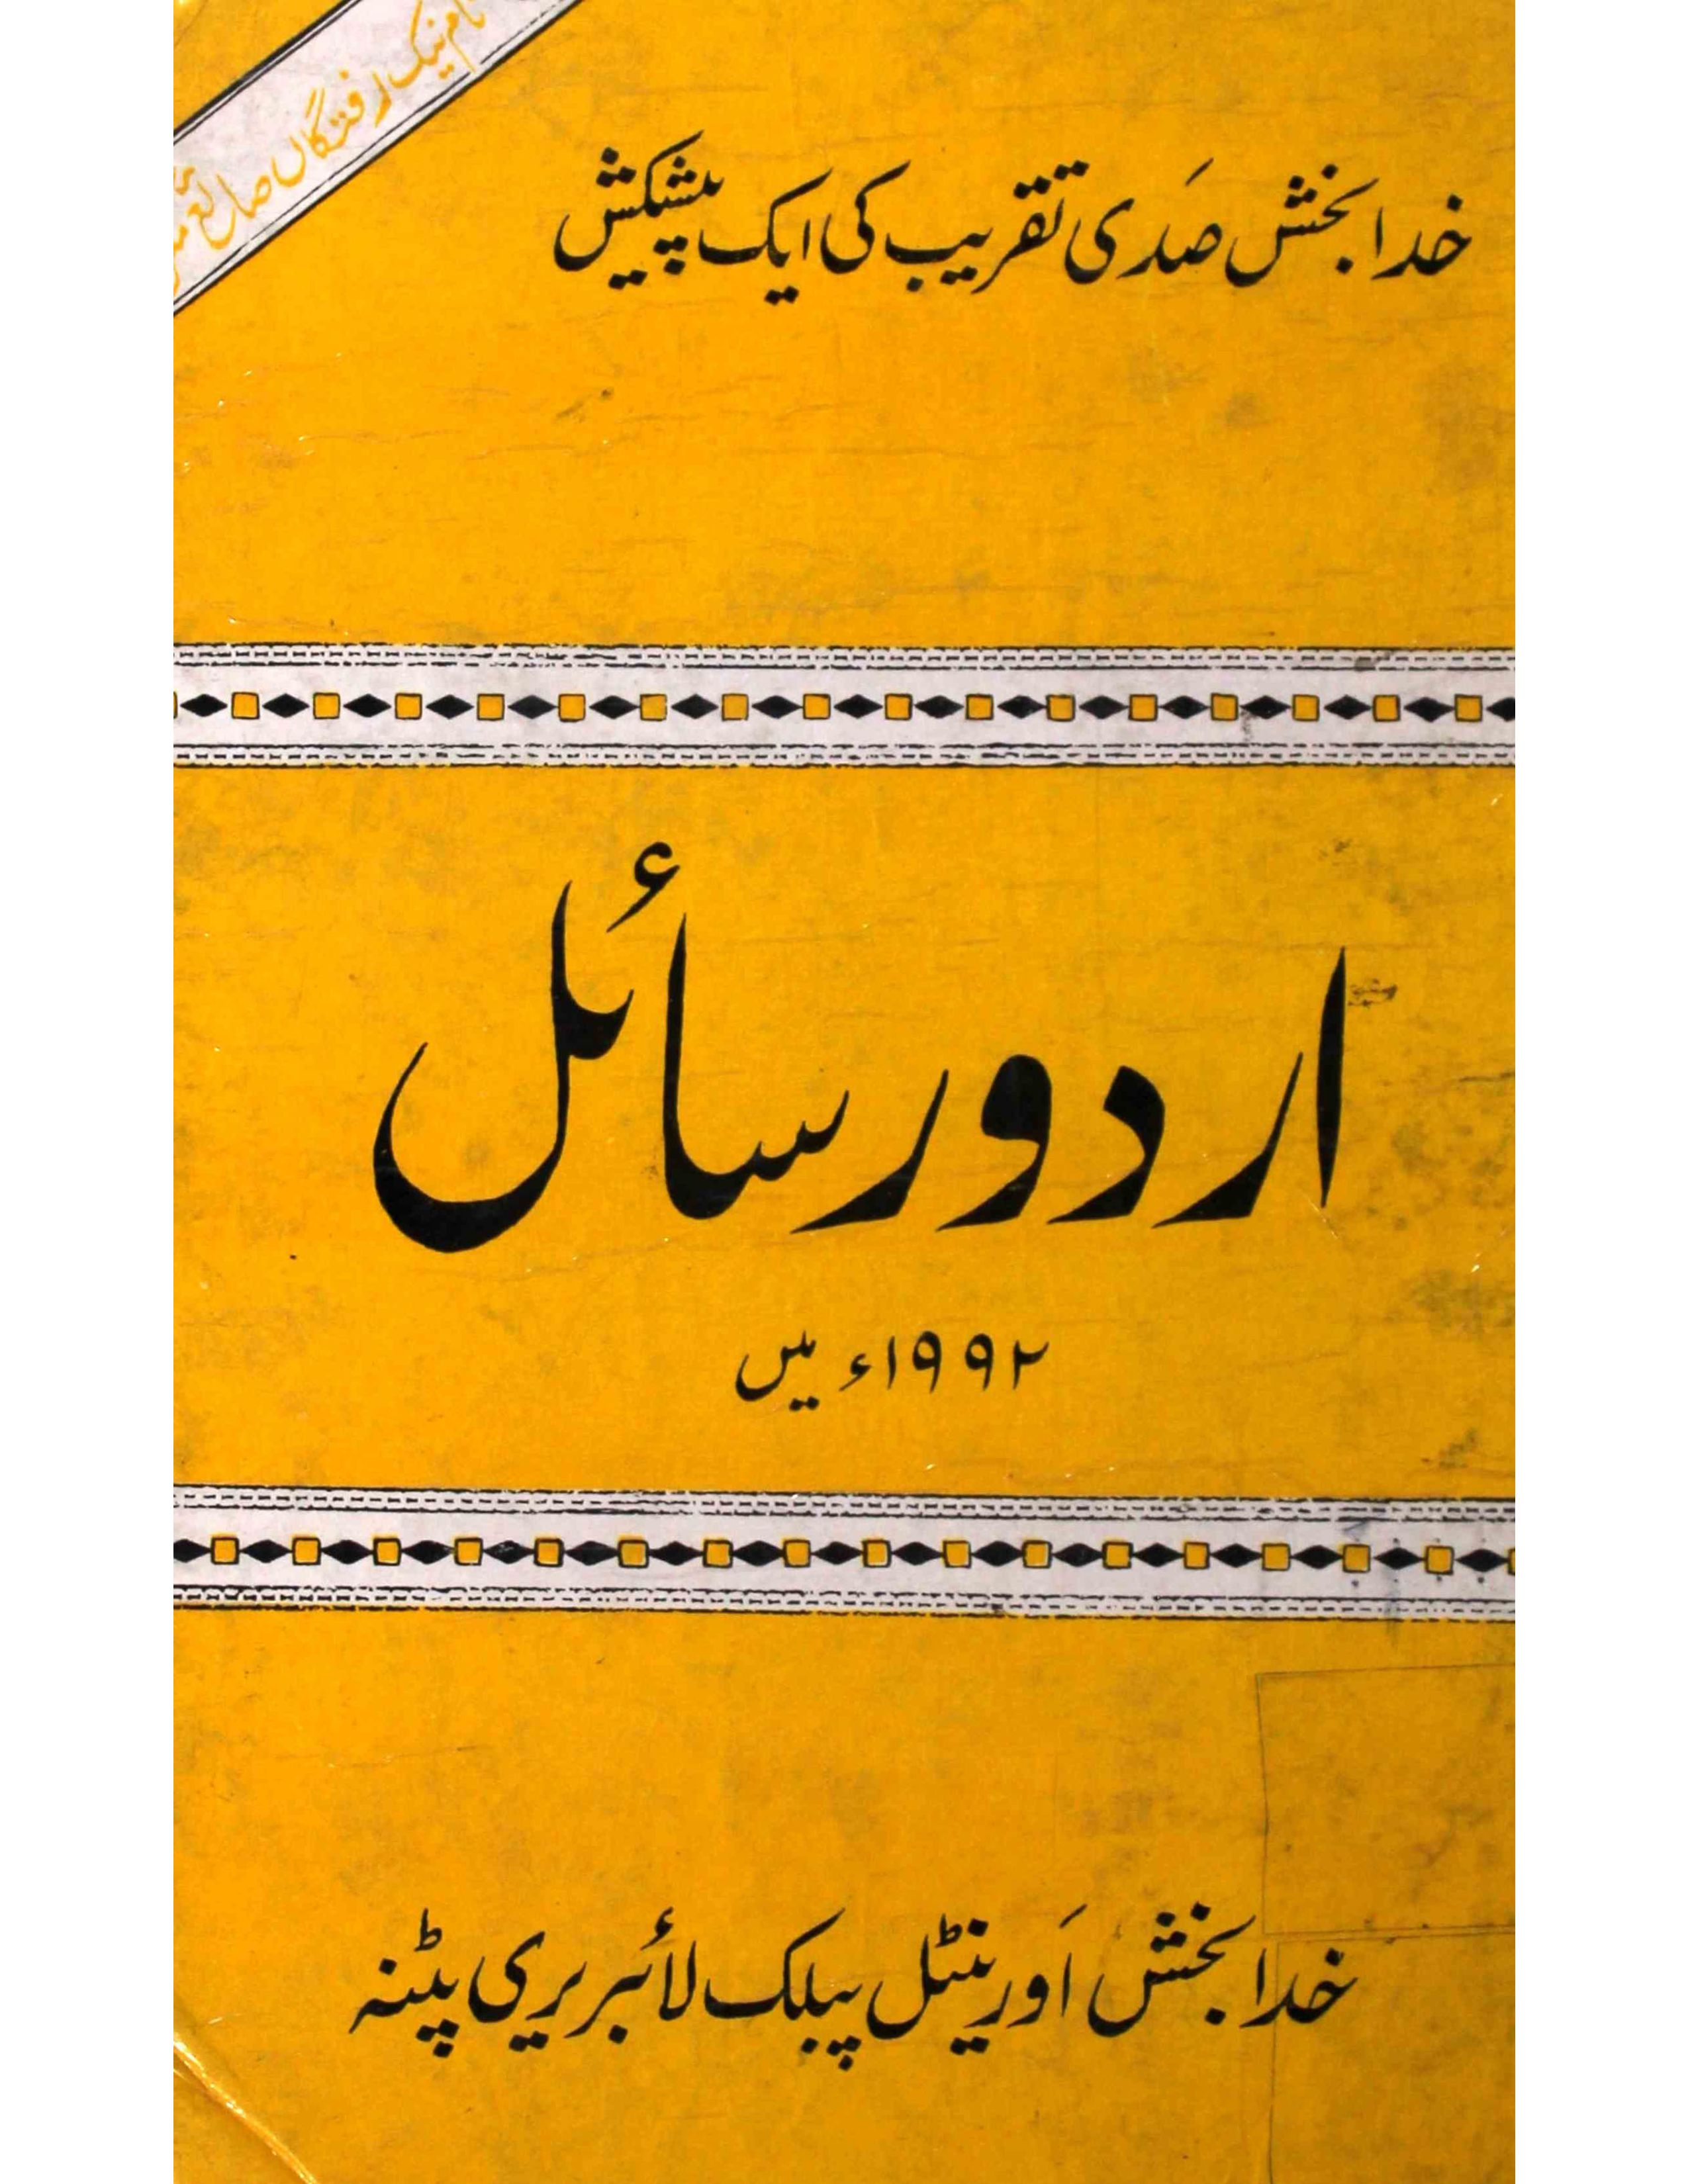 Urdu Rasail